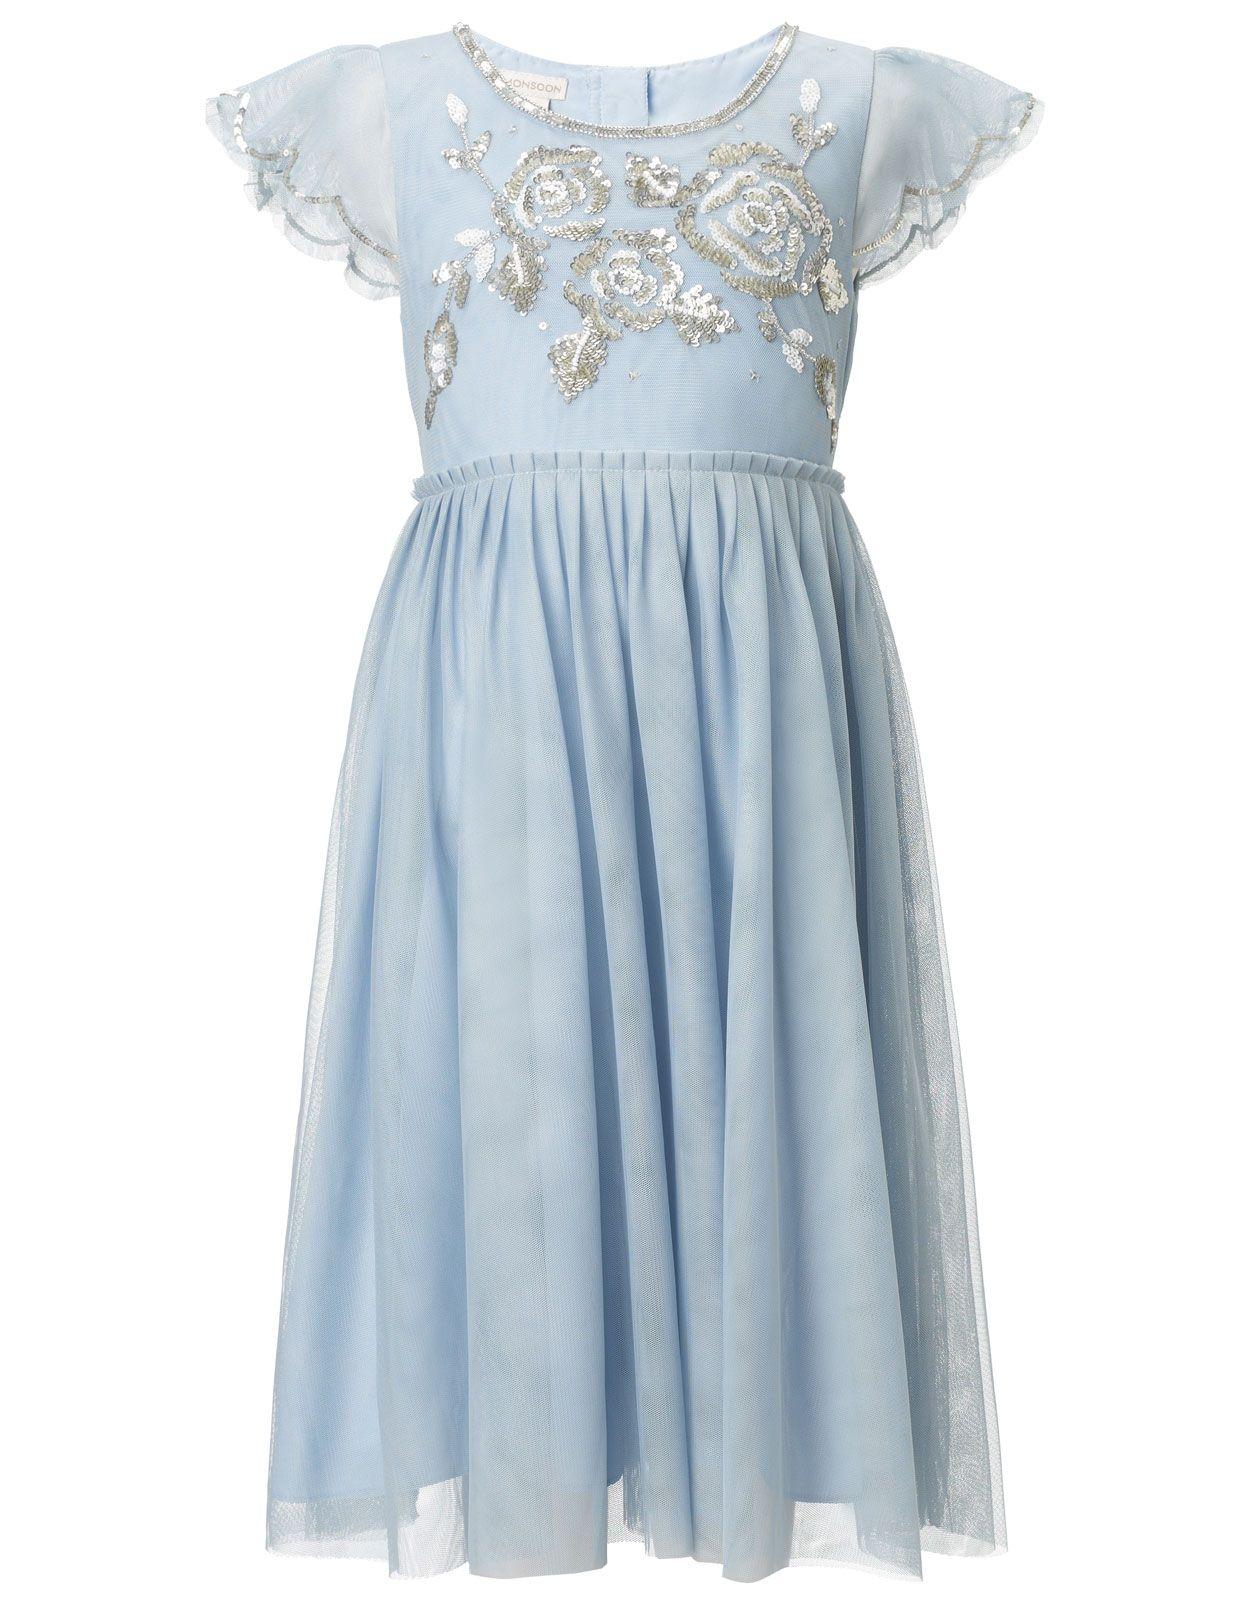 Ava rose dress blue monsoon wedding pinterest rose dress